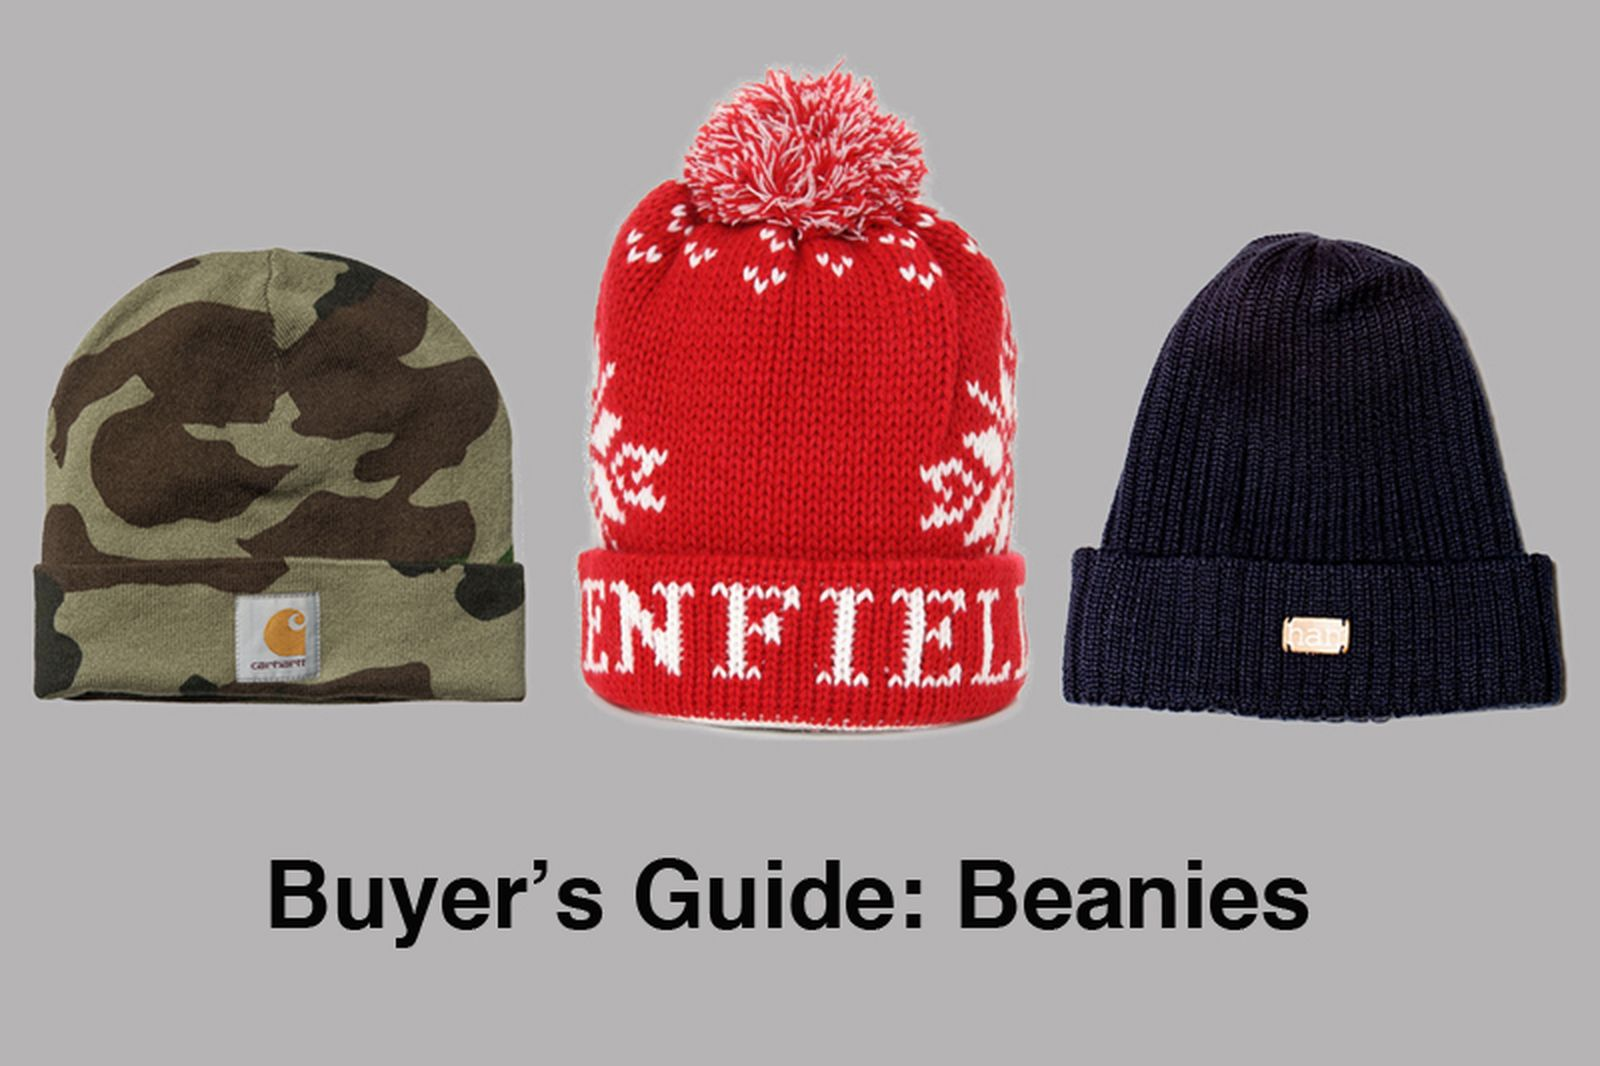 buyers-guide-beanies-1